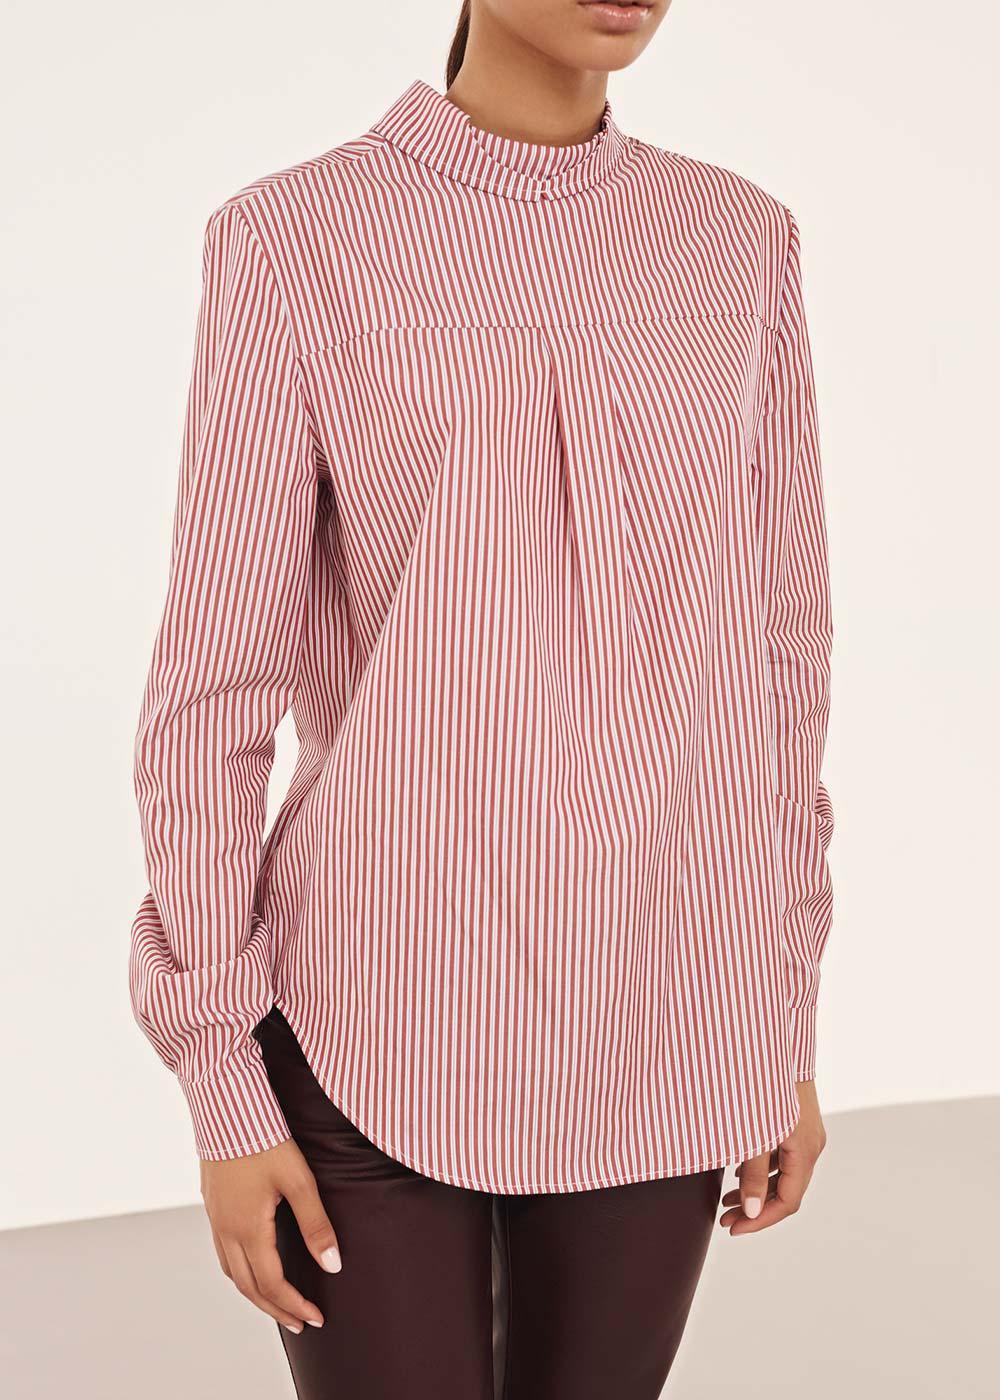 Striped Reversed Button Down Shirt - Alexander Lewis